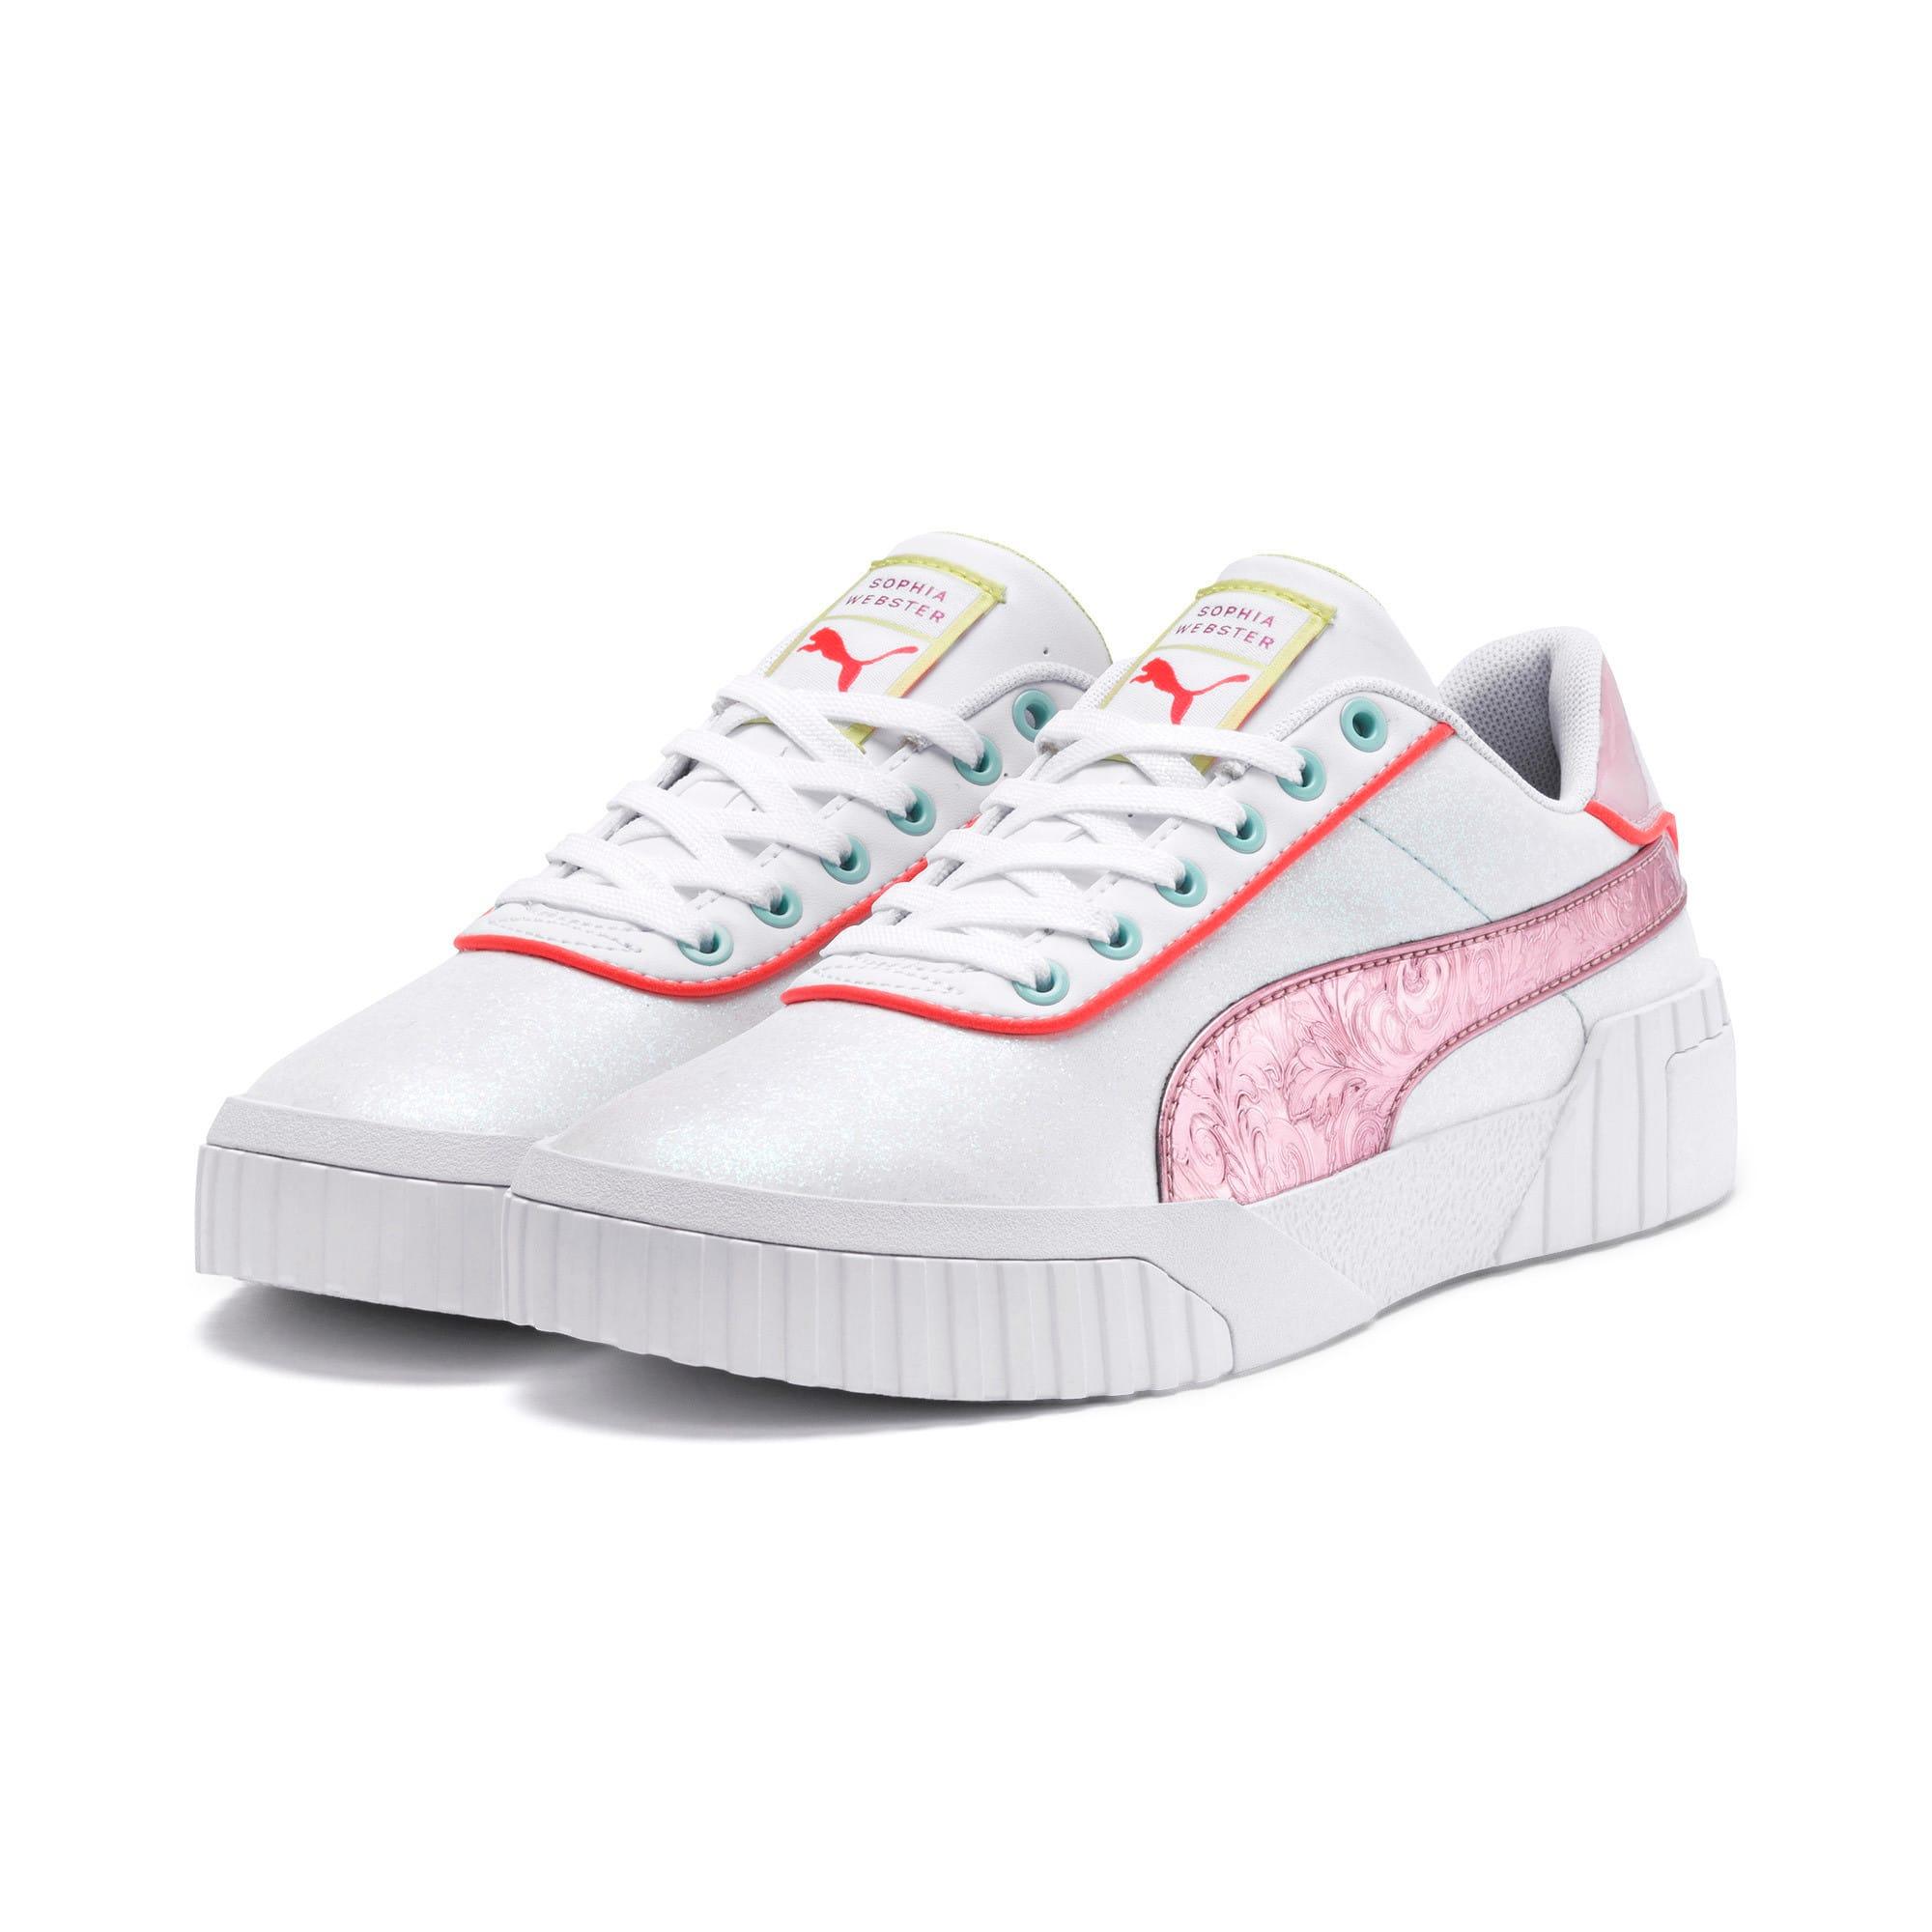 Thumbnail 2 of PUMA x SOPHIA WEBSTER Cali Women's Sneakers, Puma White-Pale Pink, medium